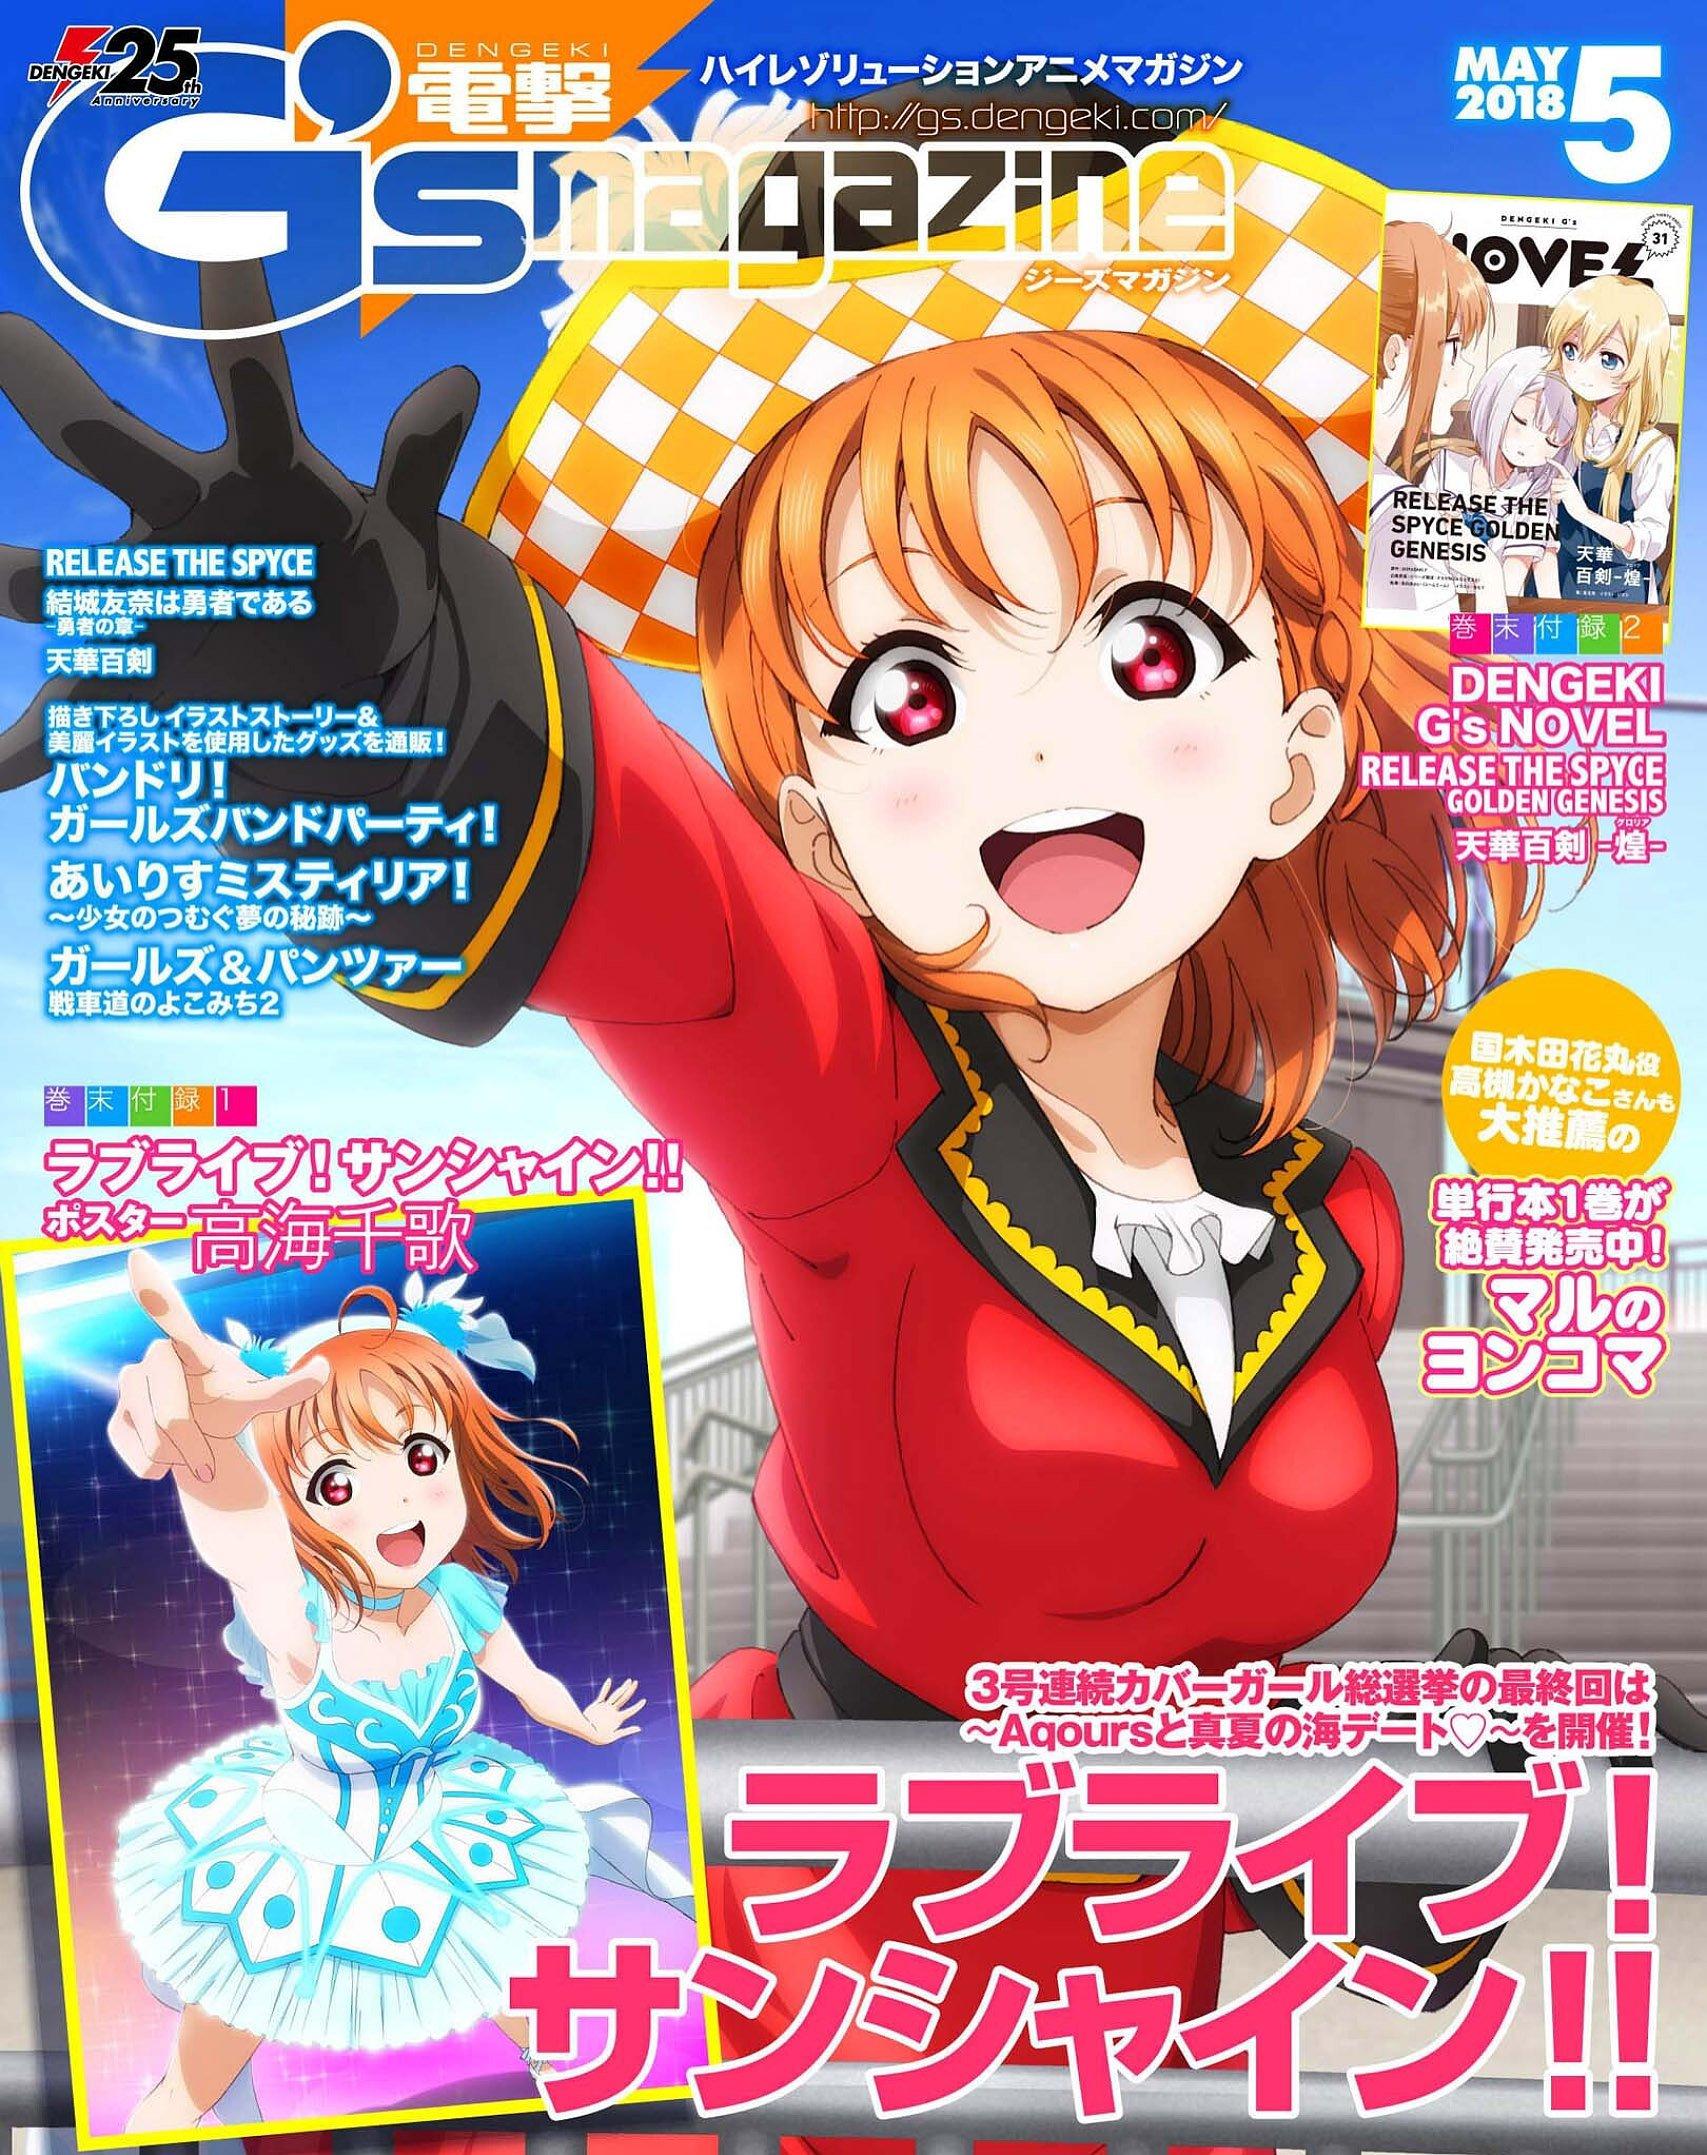 Dengeki G's Magazine Issue 250 (May 2018) (digital edition)